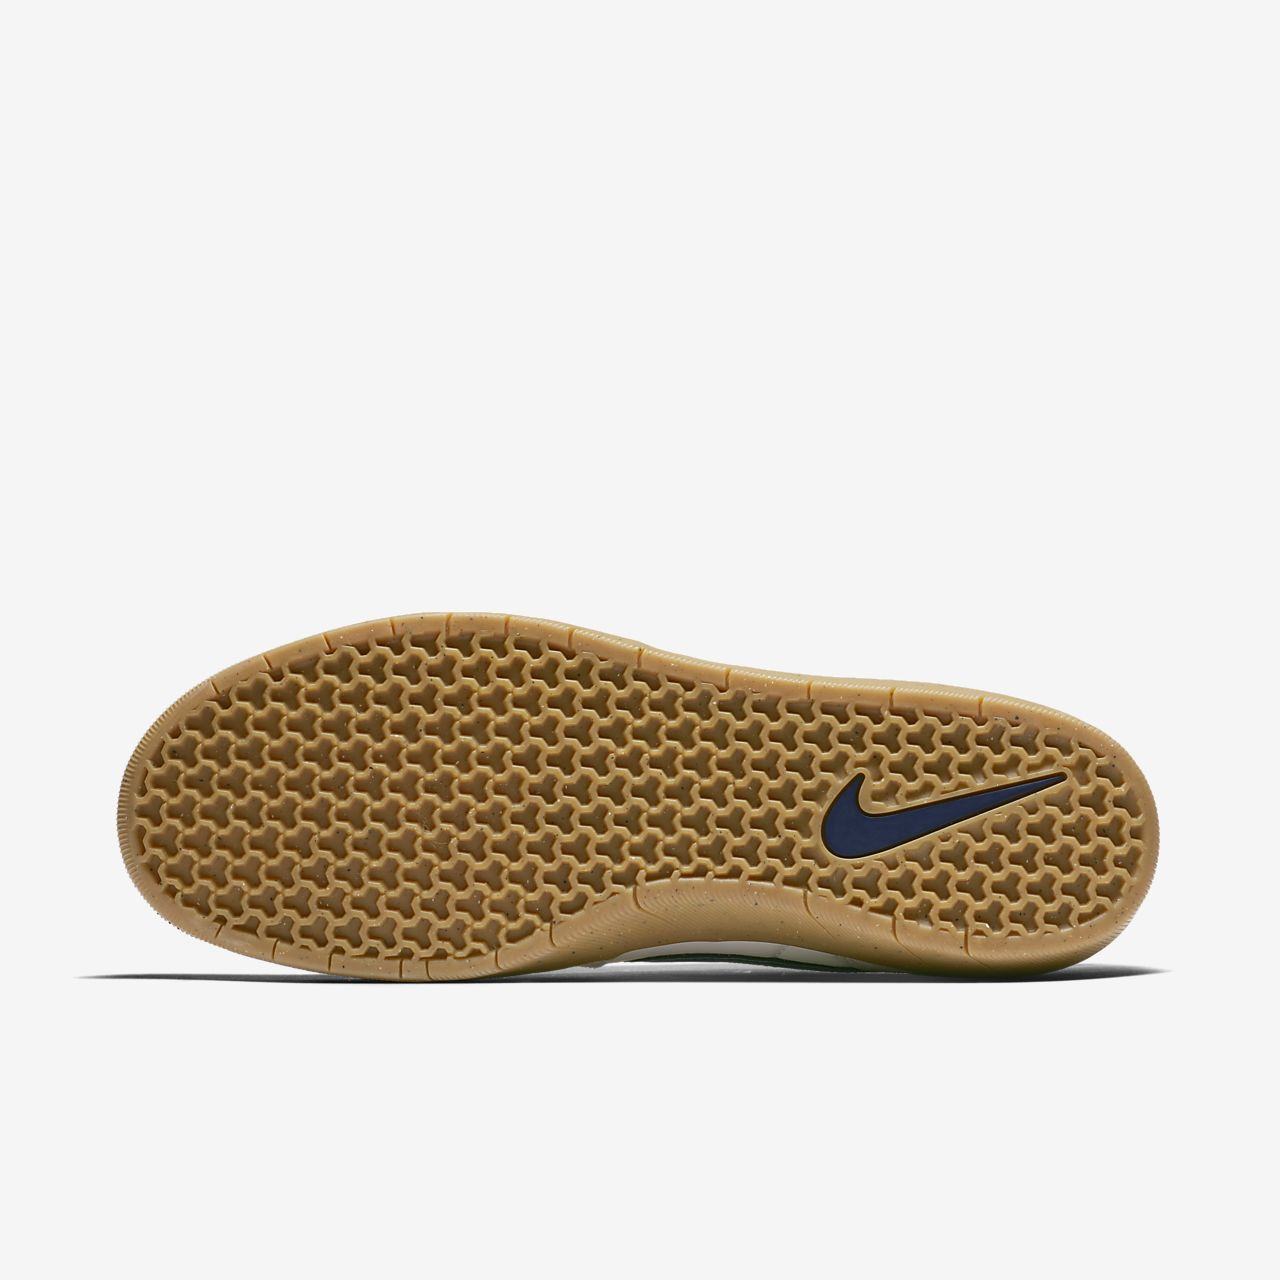 Nike Pour Homme Team Chaussure Be Skateboard Sb Classic De qnAwUYE4